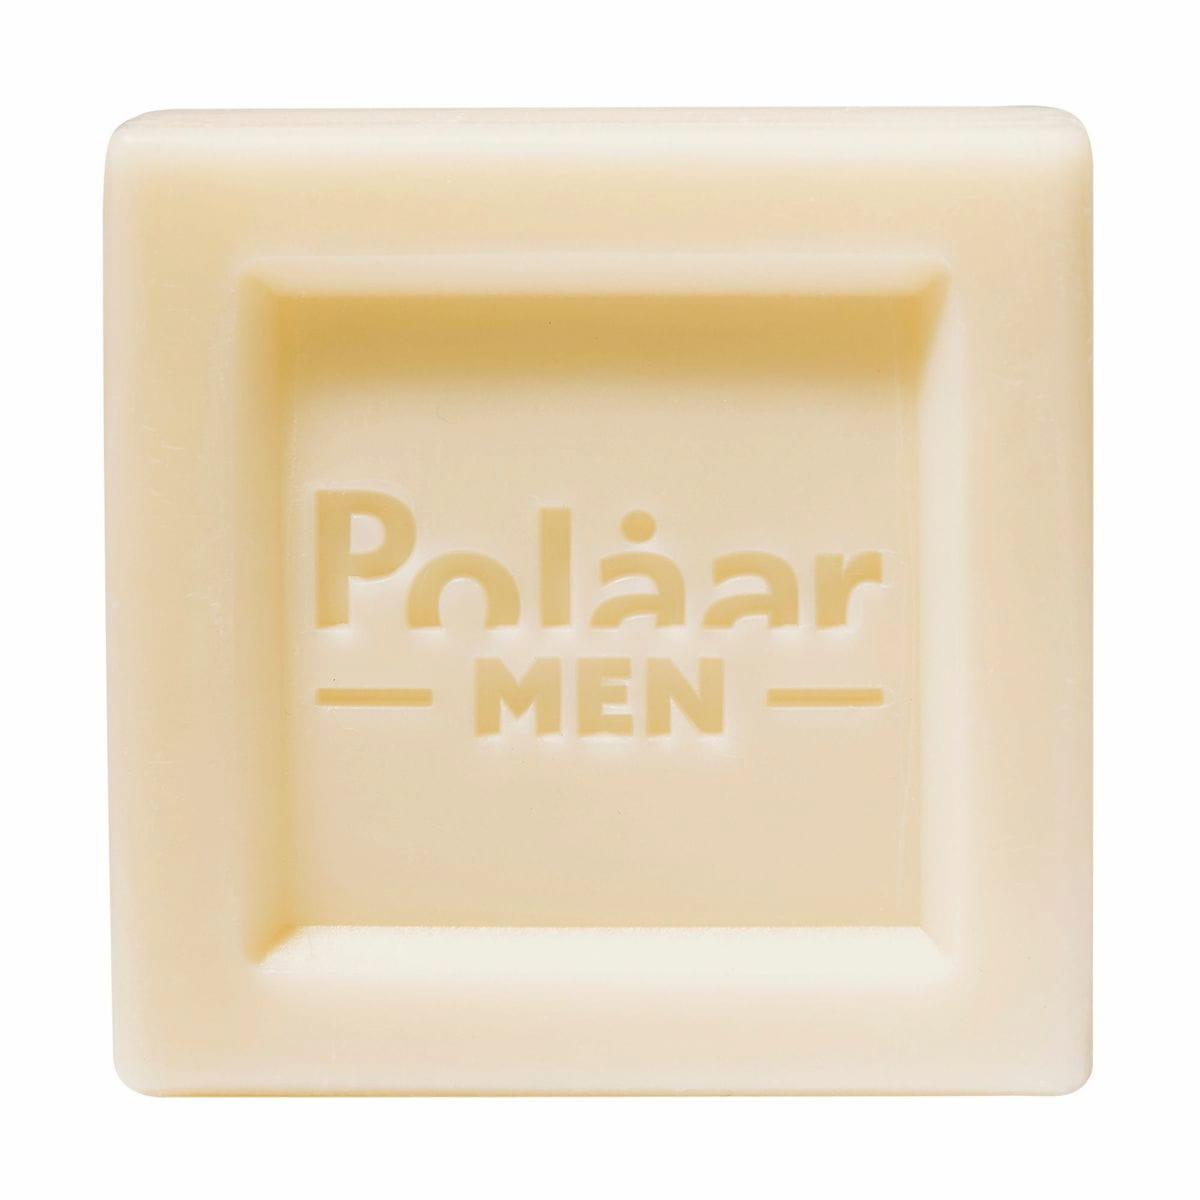 Polaar Men - Savon Scandinave - Visage, corps et cheveux